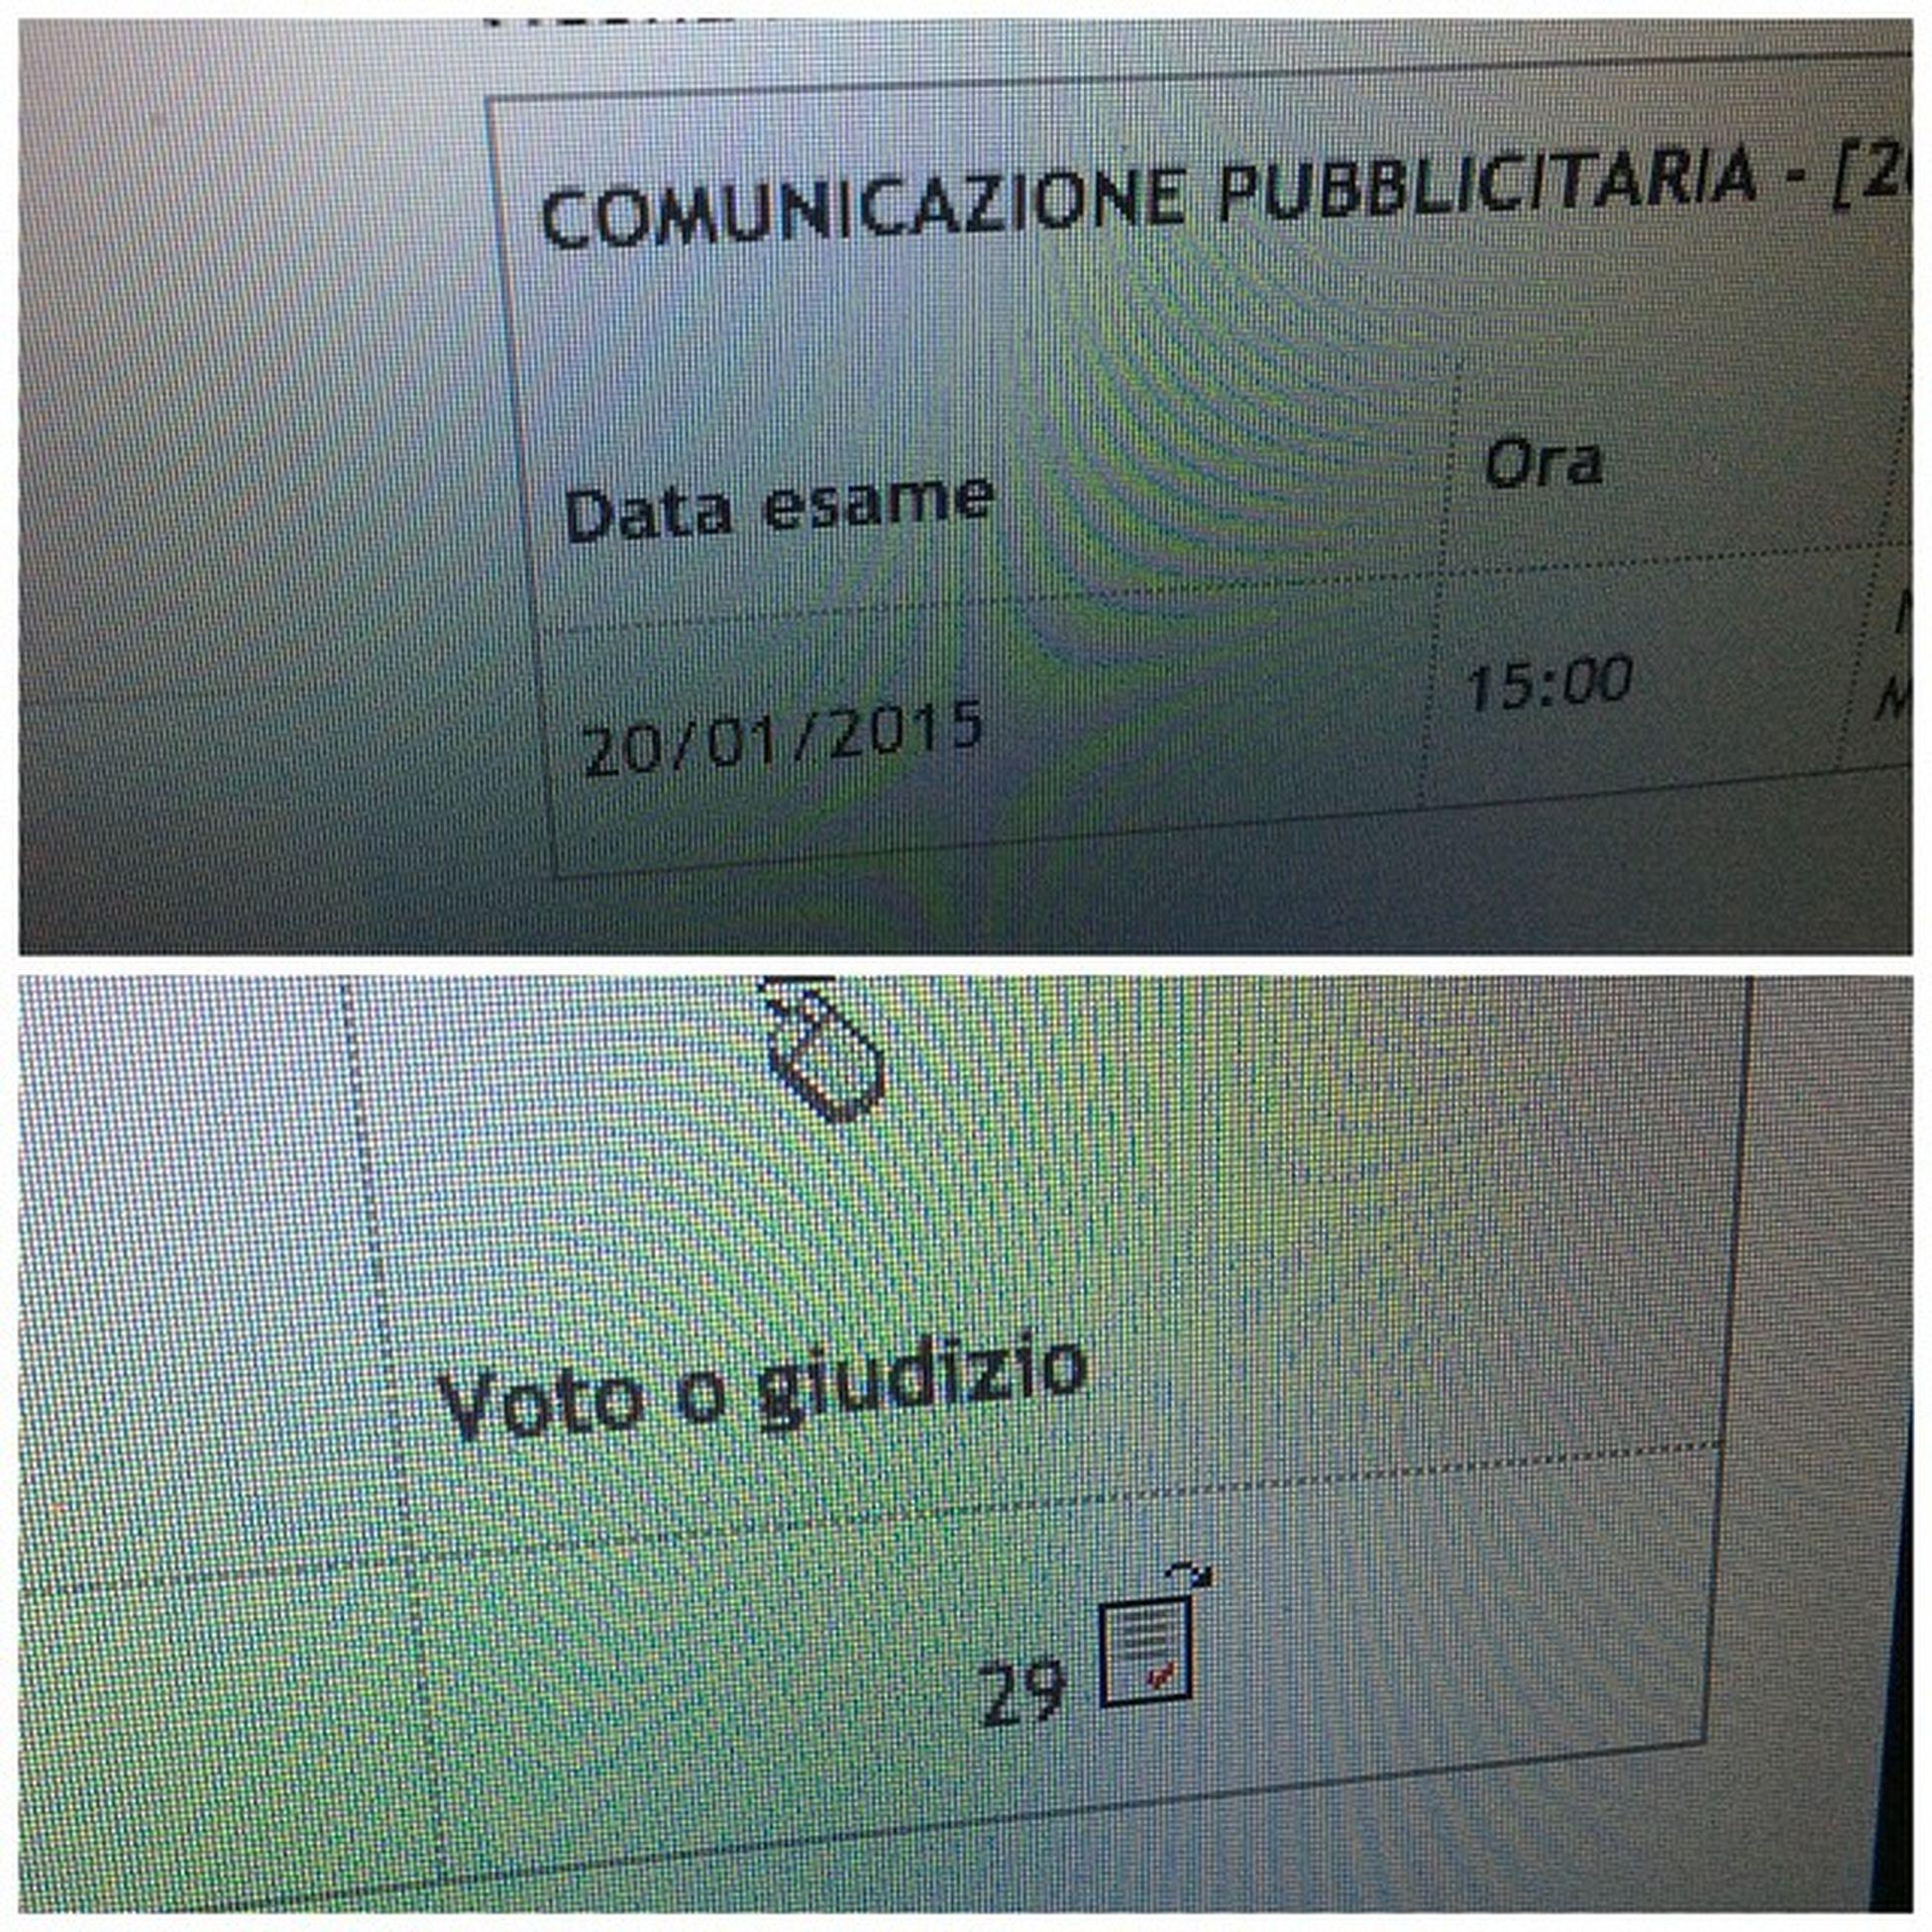 Primoesame Specialistica Romatre Lingue comunicazionepubblicitaria proudofme exam university masterdegree magistrale RomaUniRomaTre sosoddisfazioni